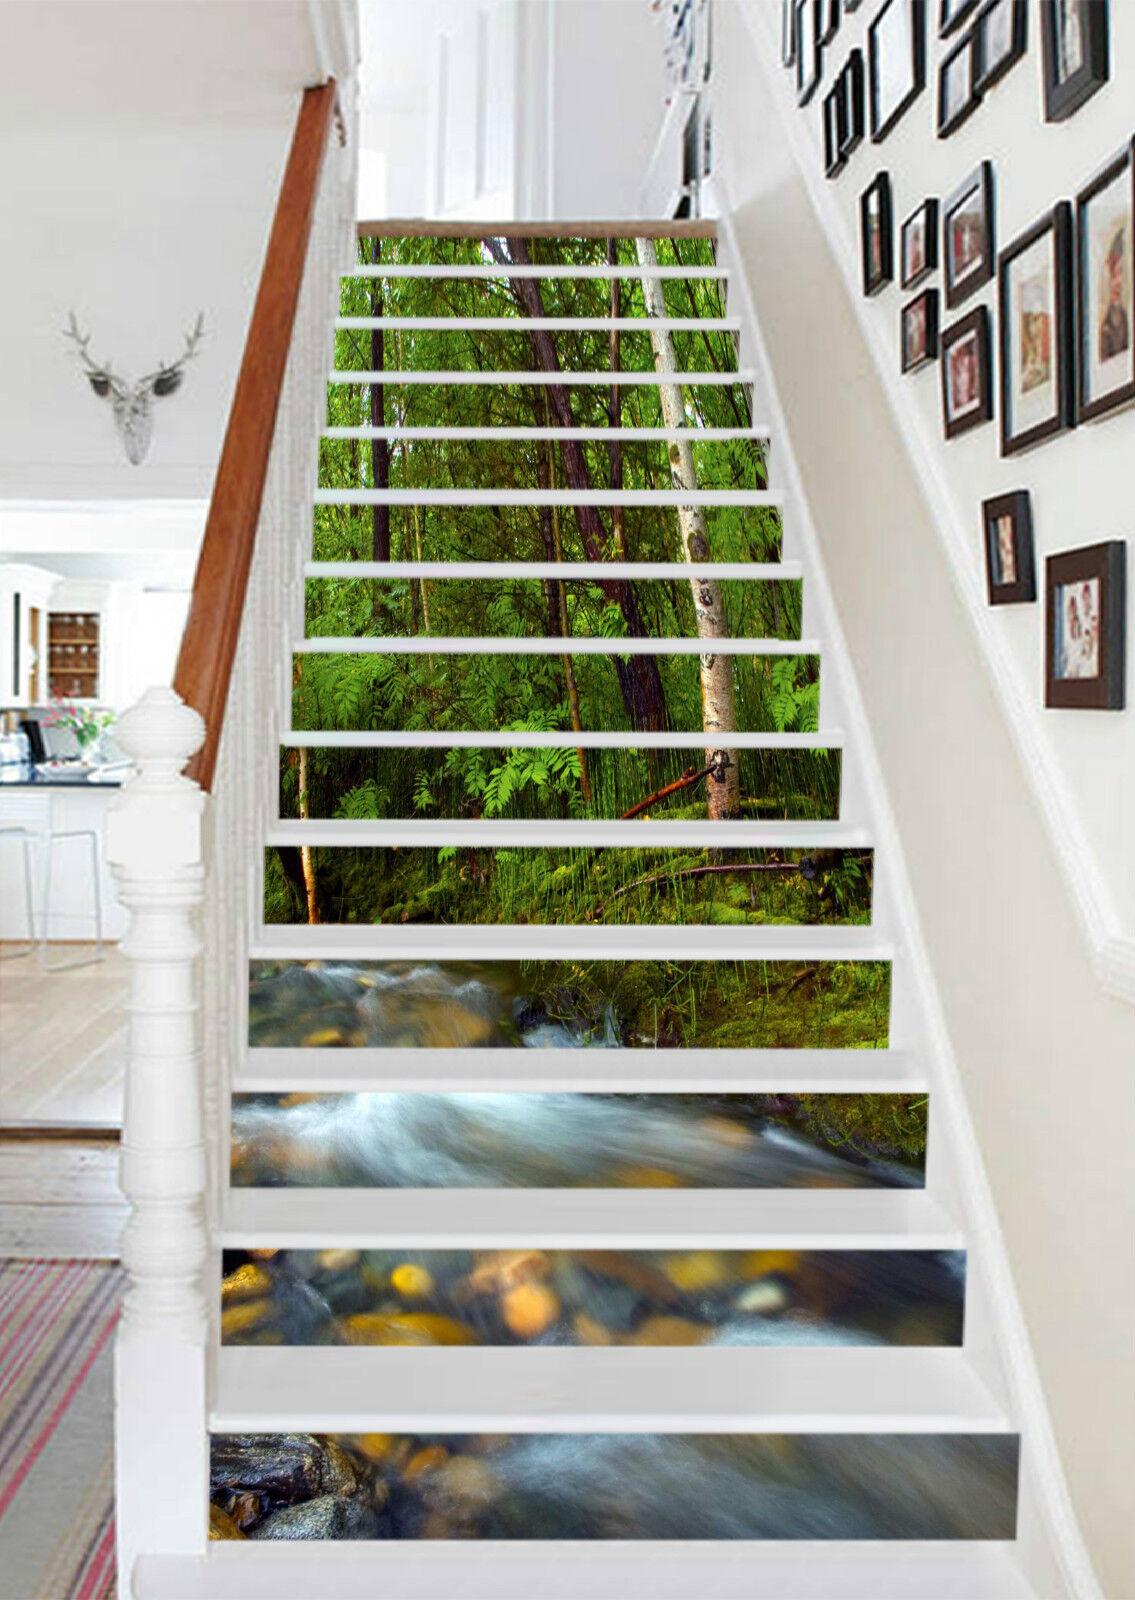 3D Baum Strom 235 Stair Risers Dekoration Fototapete Vinyl Aufkleber Tapete DE